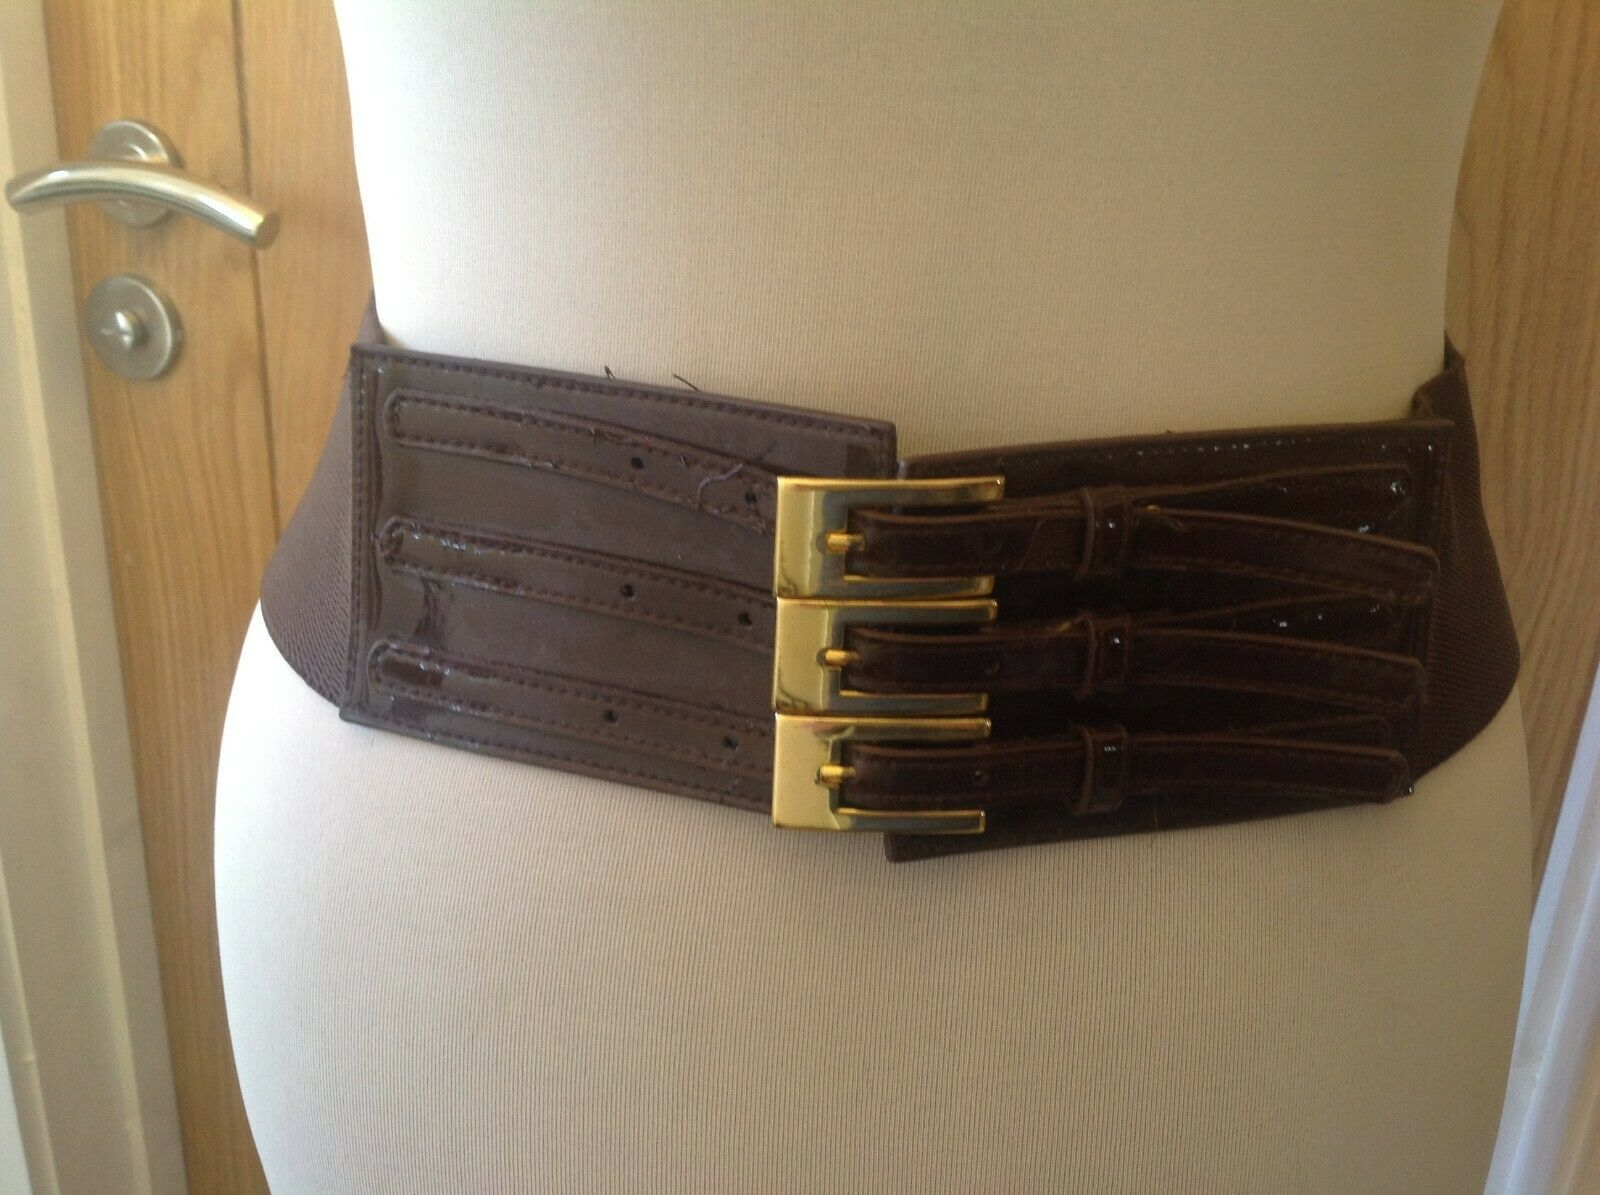 Ladies Various BROWN Belts - various widths and styles stretch / rivet / plain